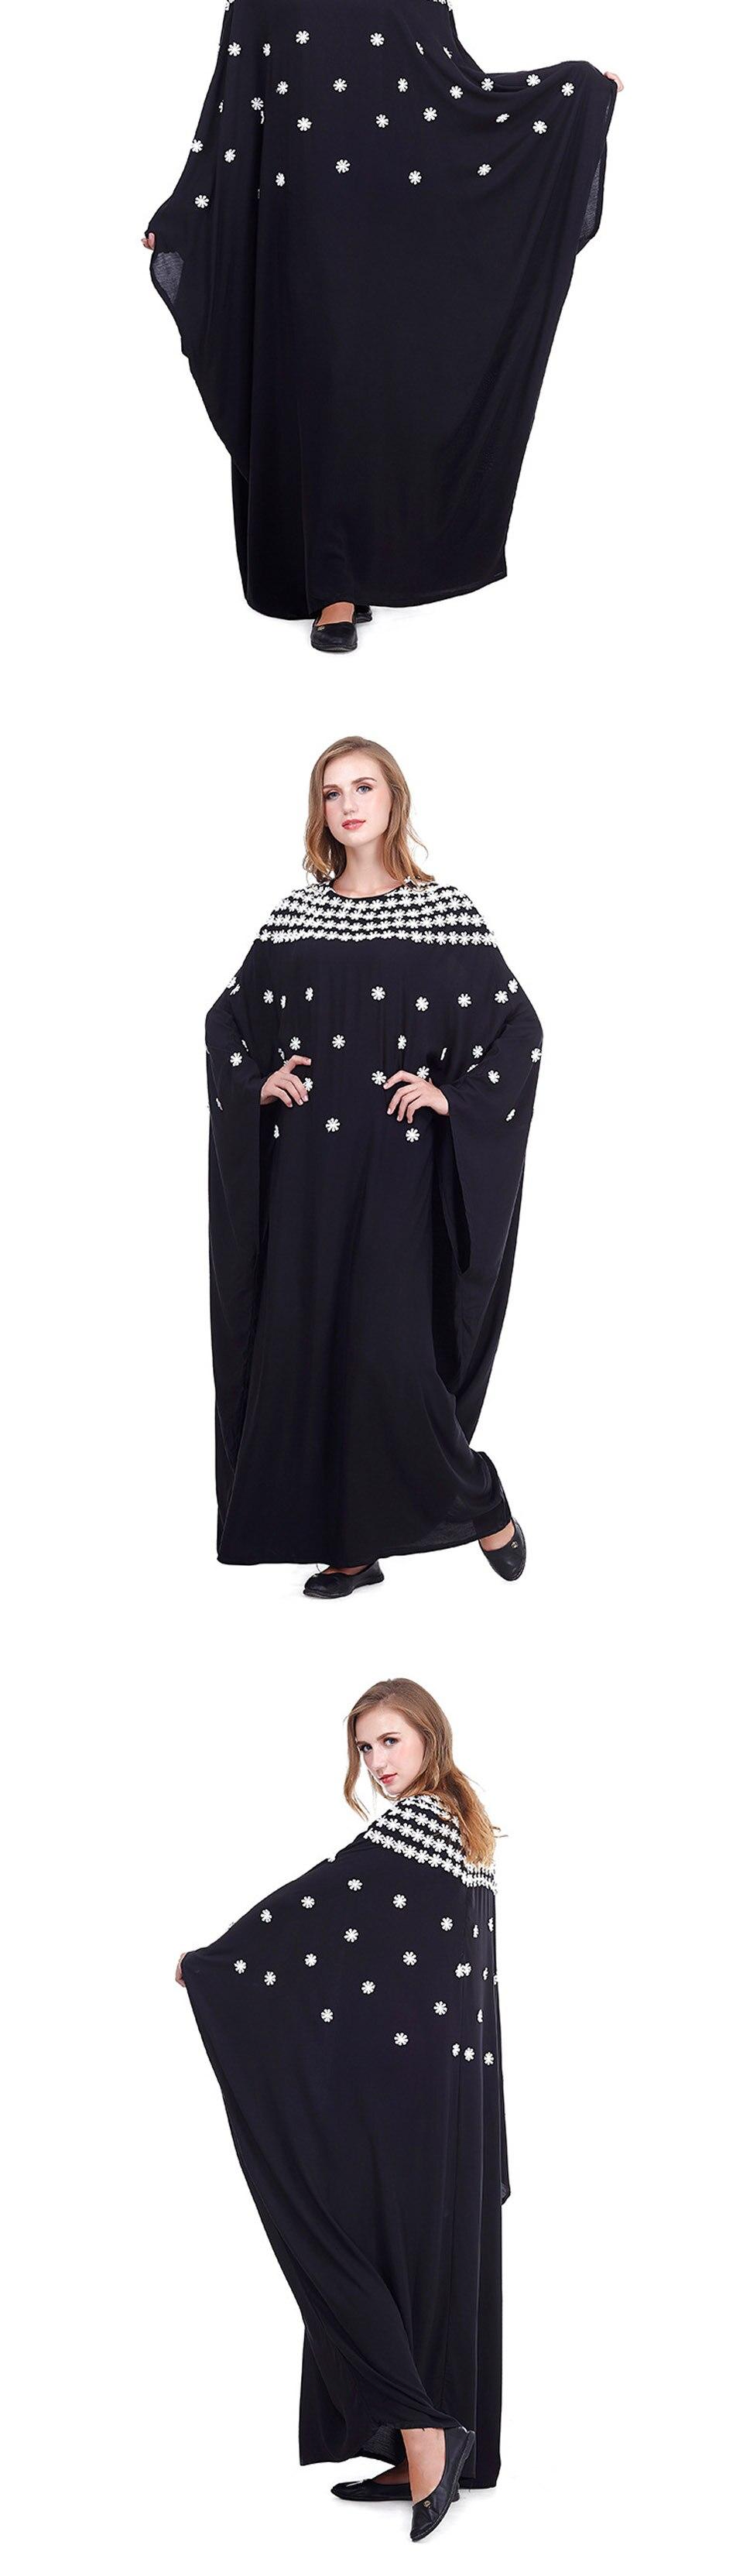 Muslim Abaya Dubai Dress Spring And Autumn Women's Embroidered Bat Sleeve Arabic Dress Loose Casual kaftans For Women Plus Size Dresses Islamic Prayer Dress